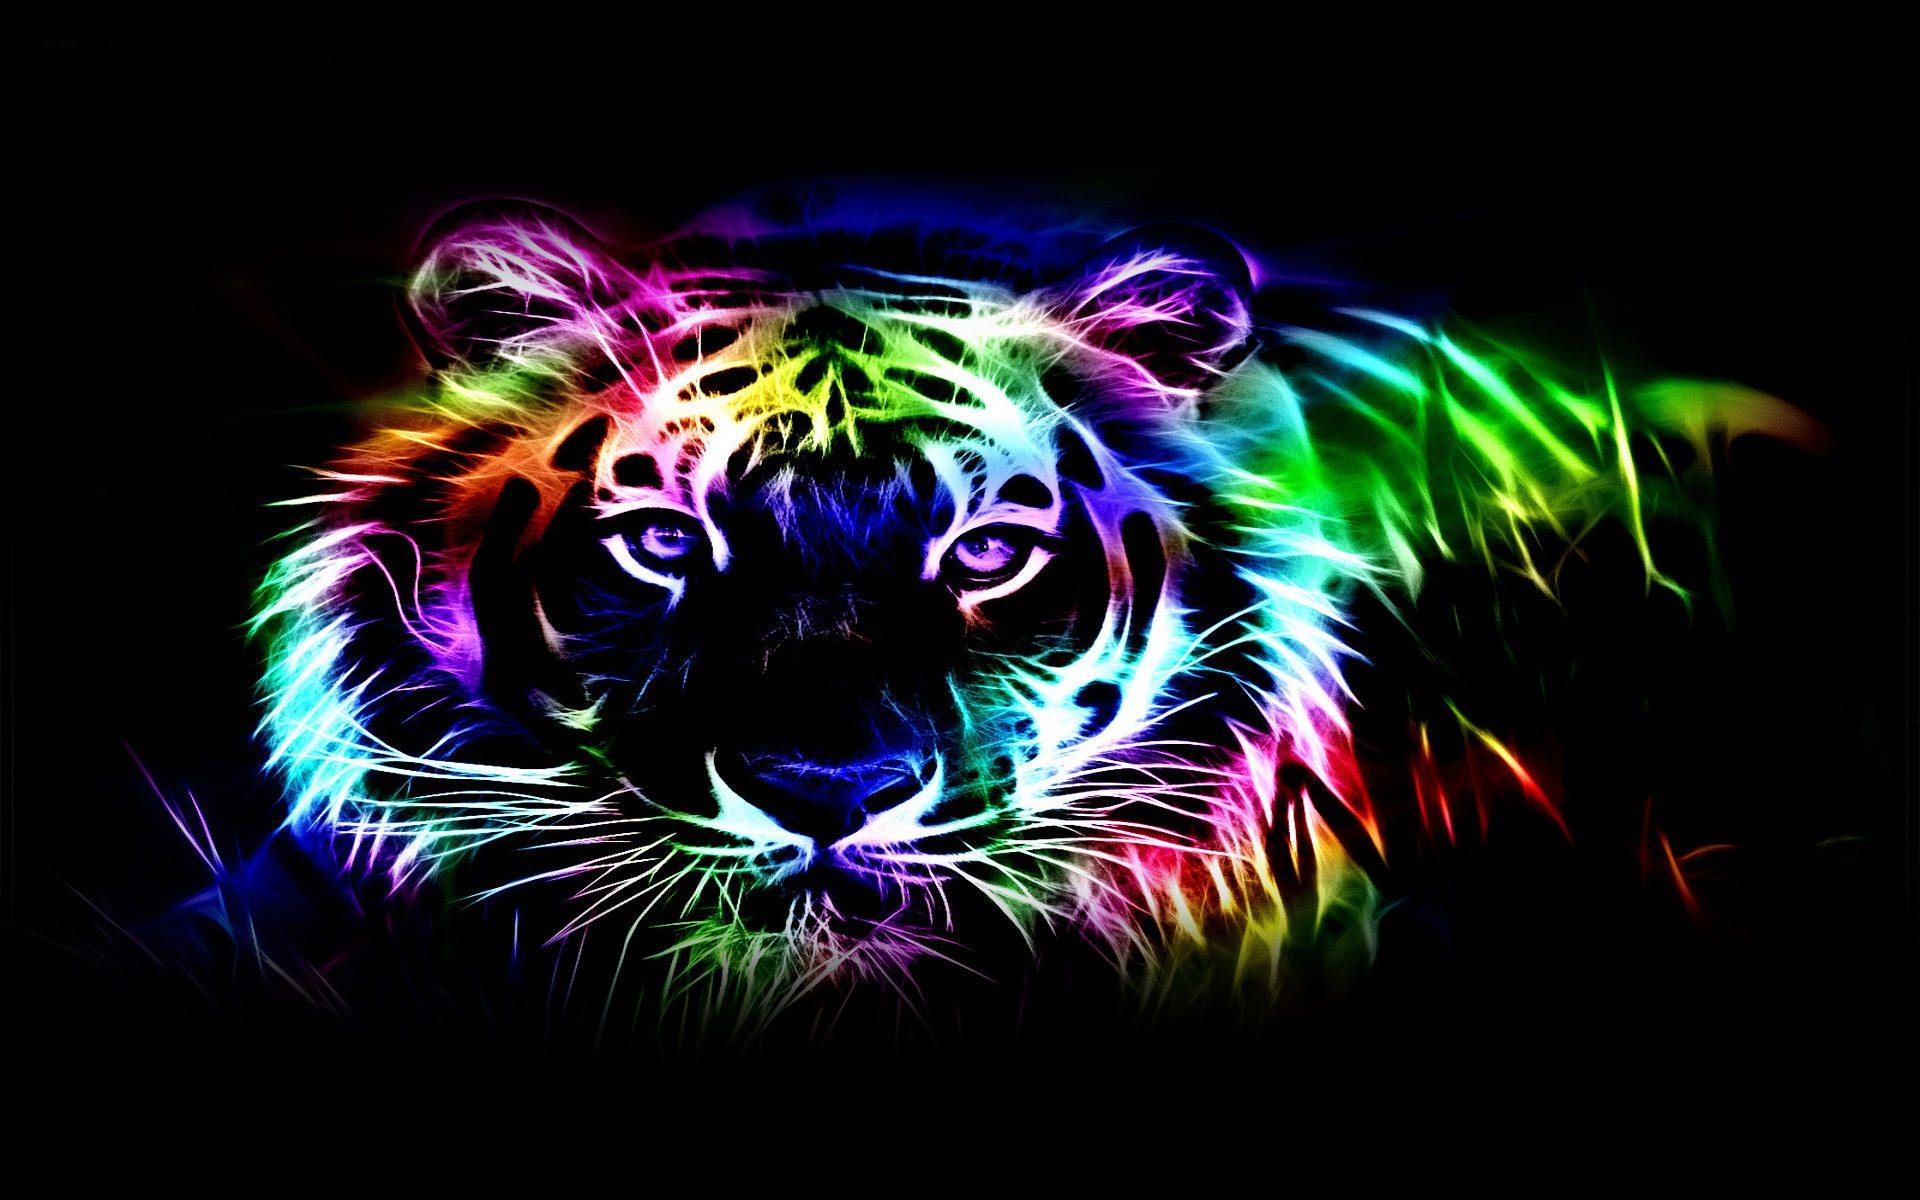 Neon tiger wallpaper wallpapersafari - Neon animals wallpaper ...